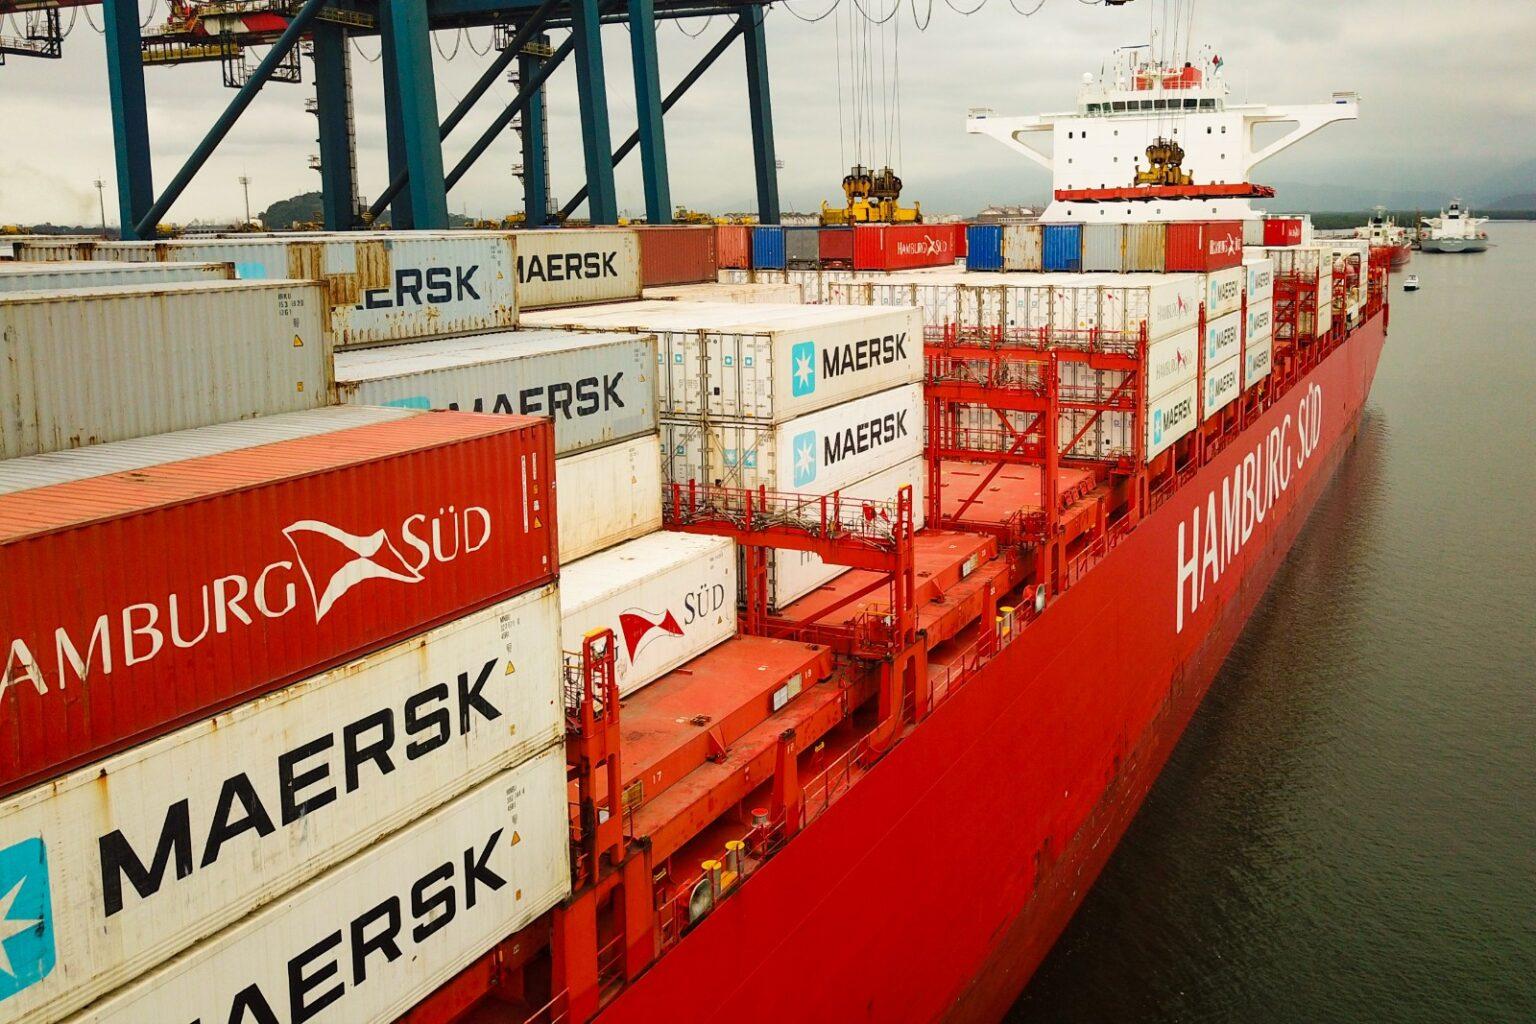 Port of Santos authorised to receive 366 m vessels